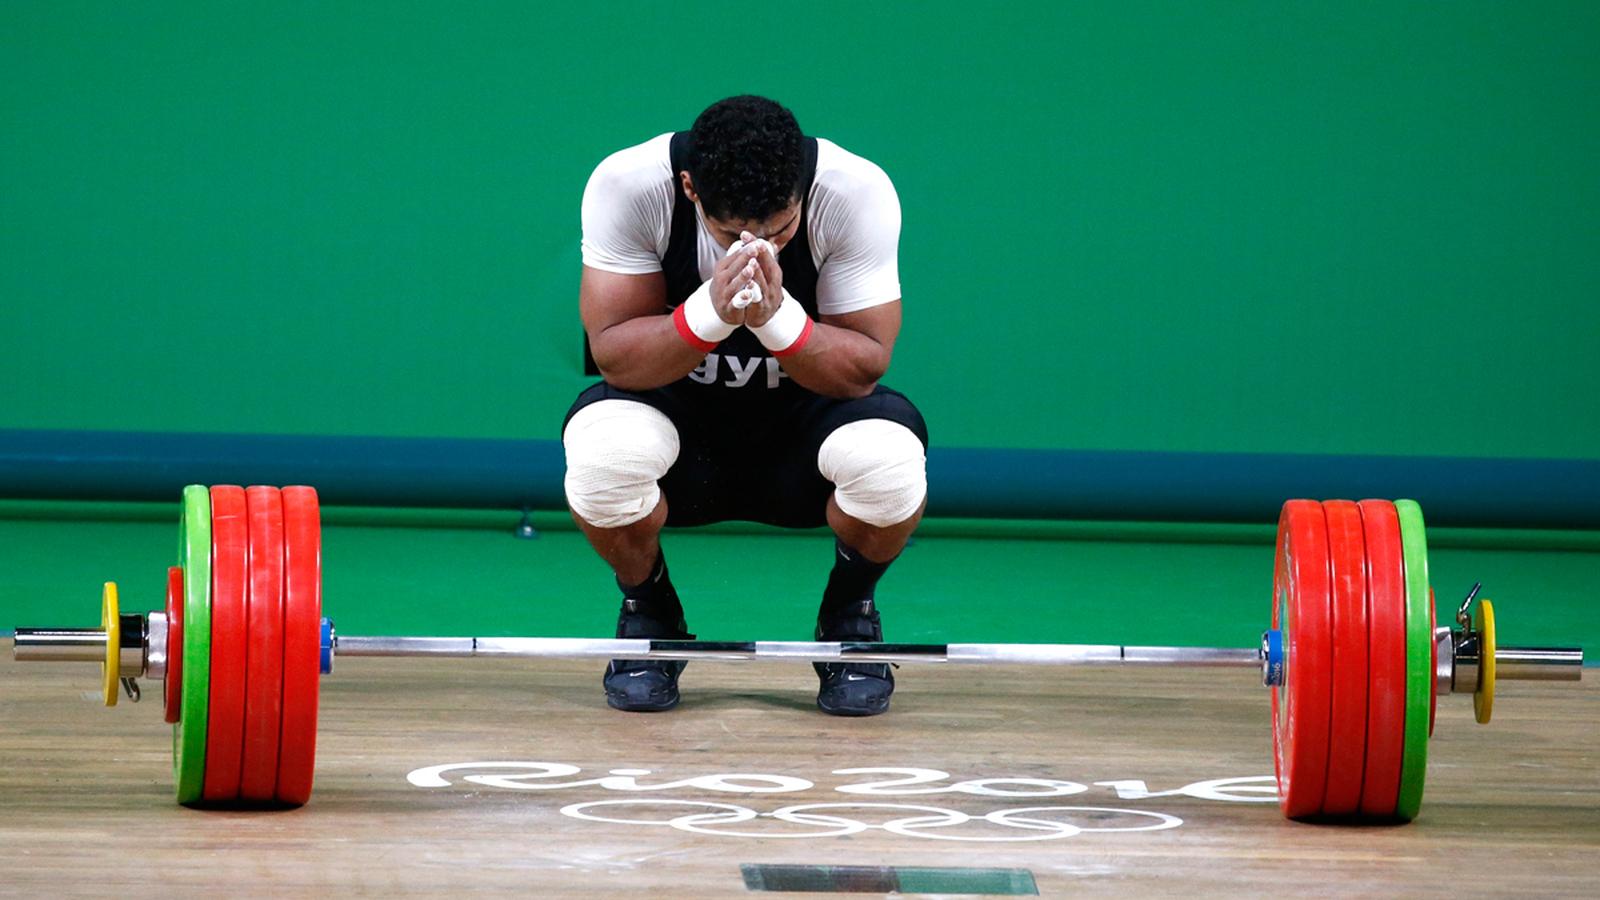 Египетский тяжелоатлет Мохаммед Махмуд совершает ритуал перед штангой